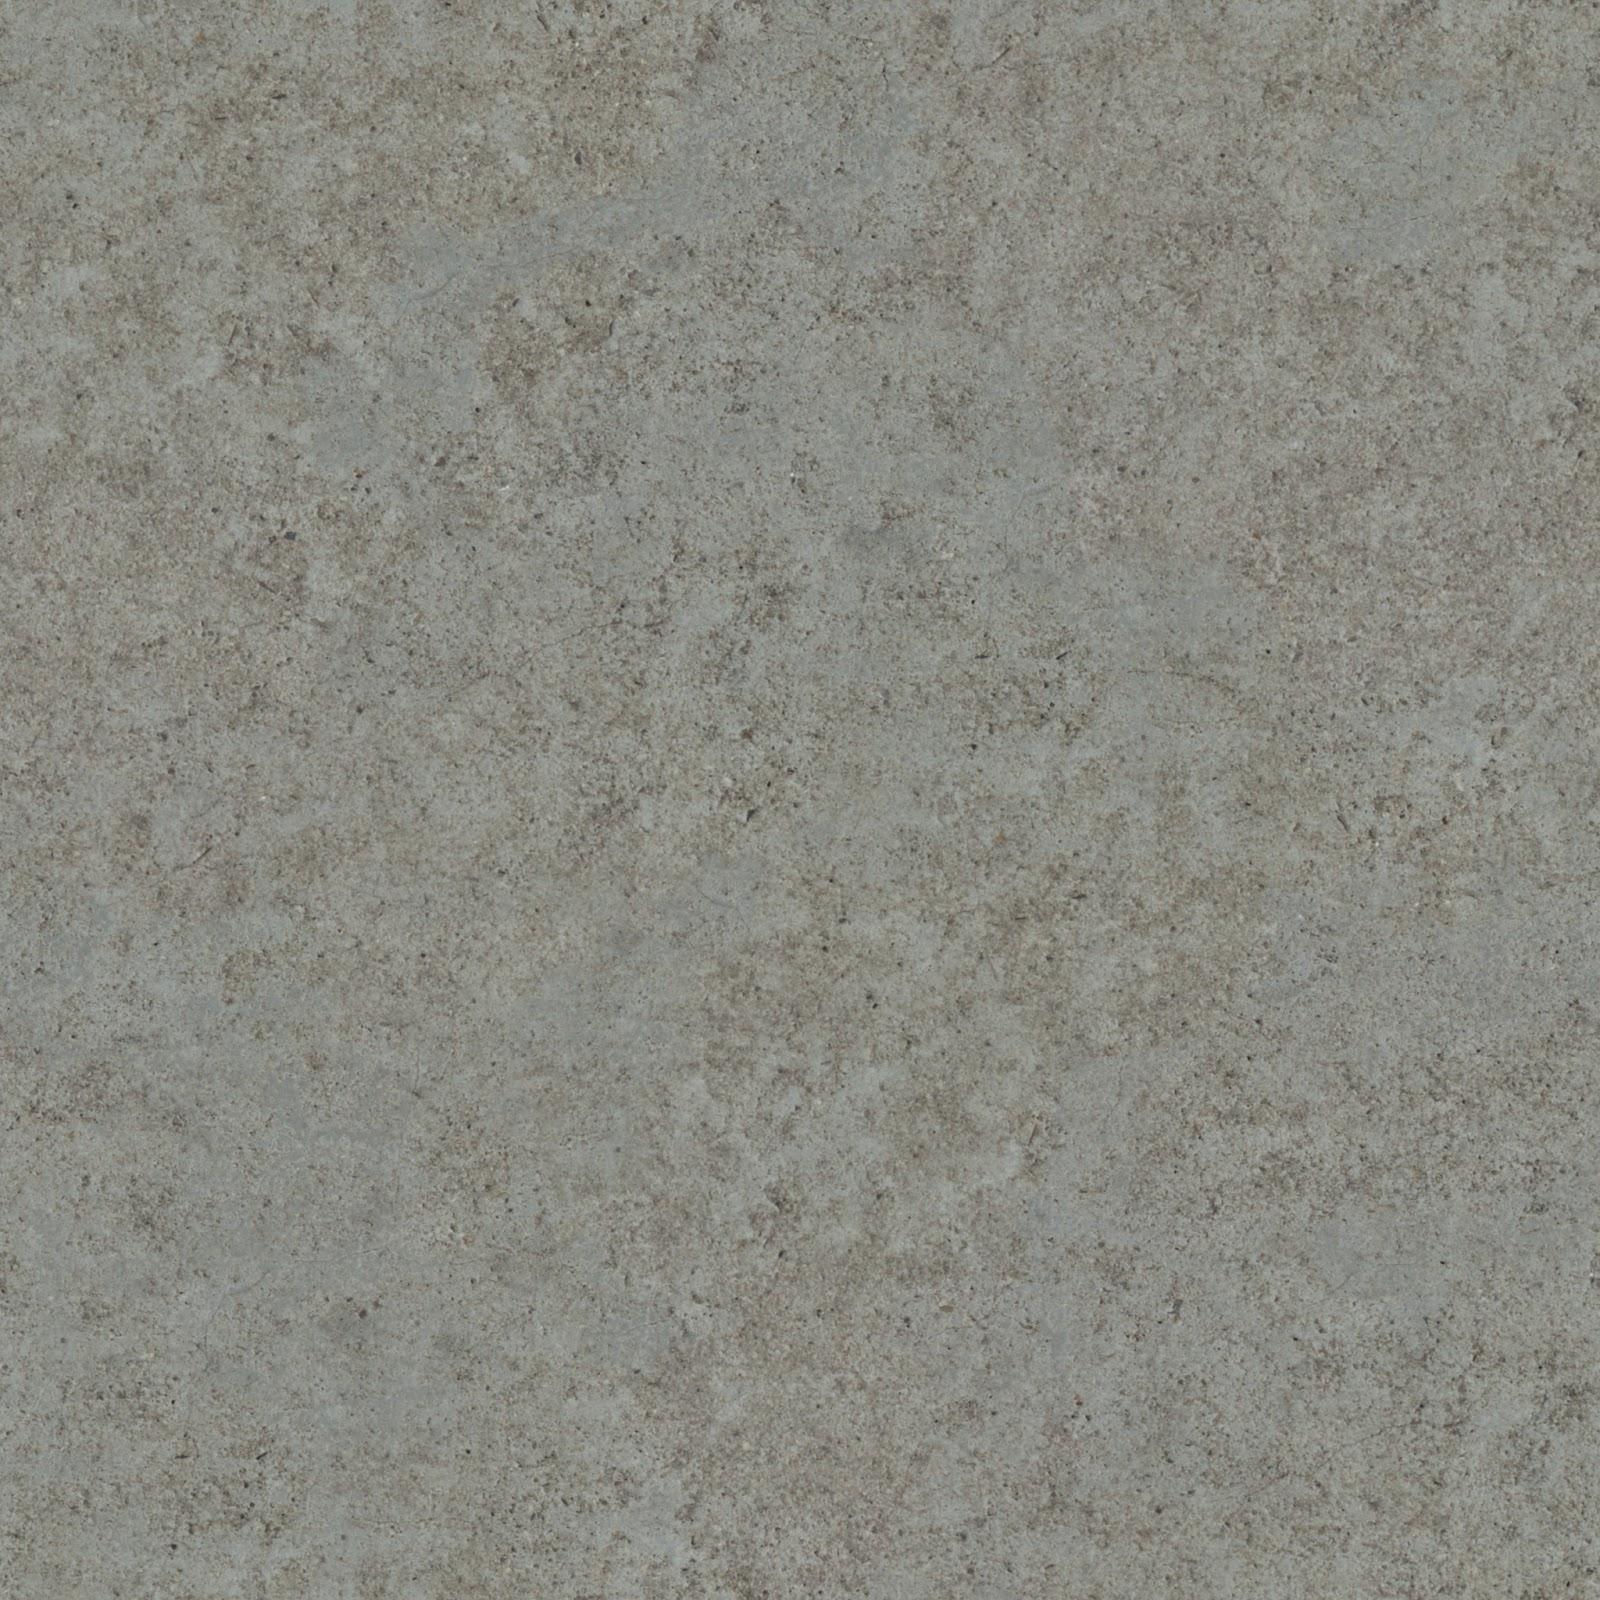 (CONCRETE 8) seamless granite wall smooth pillar texture 2048x2048